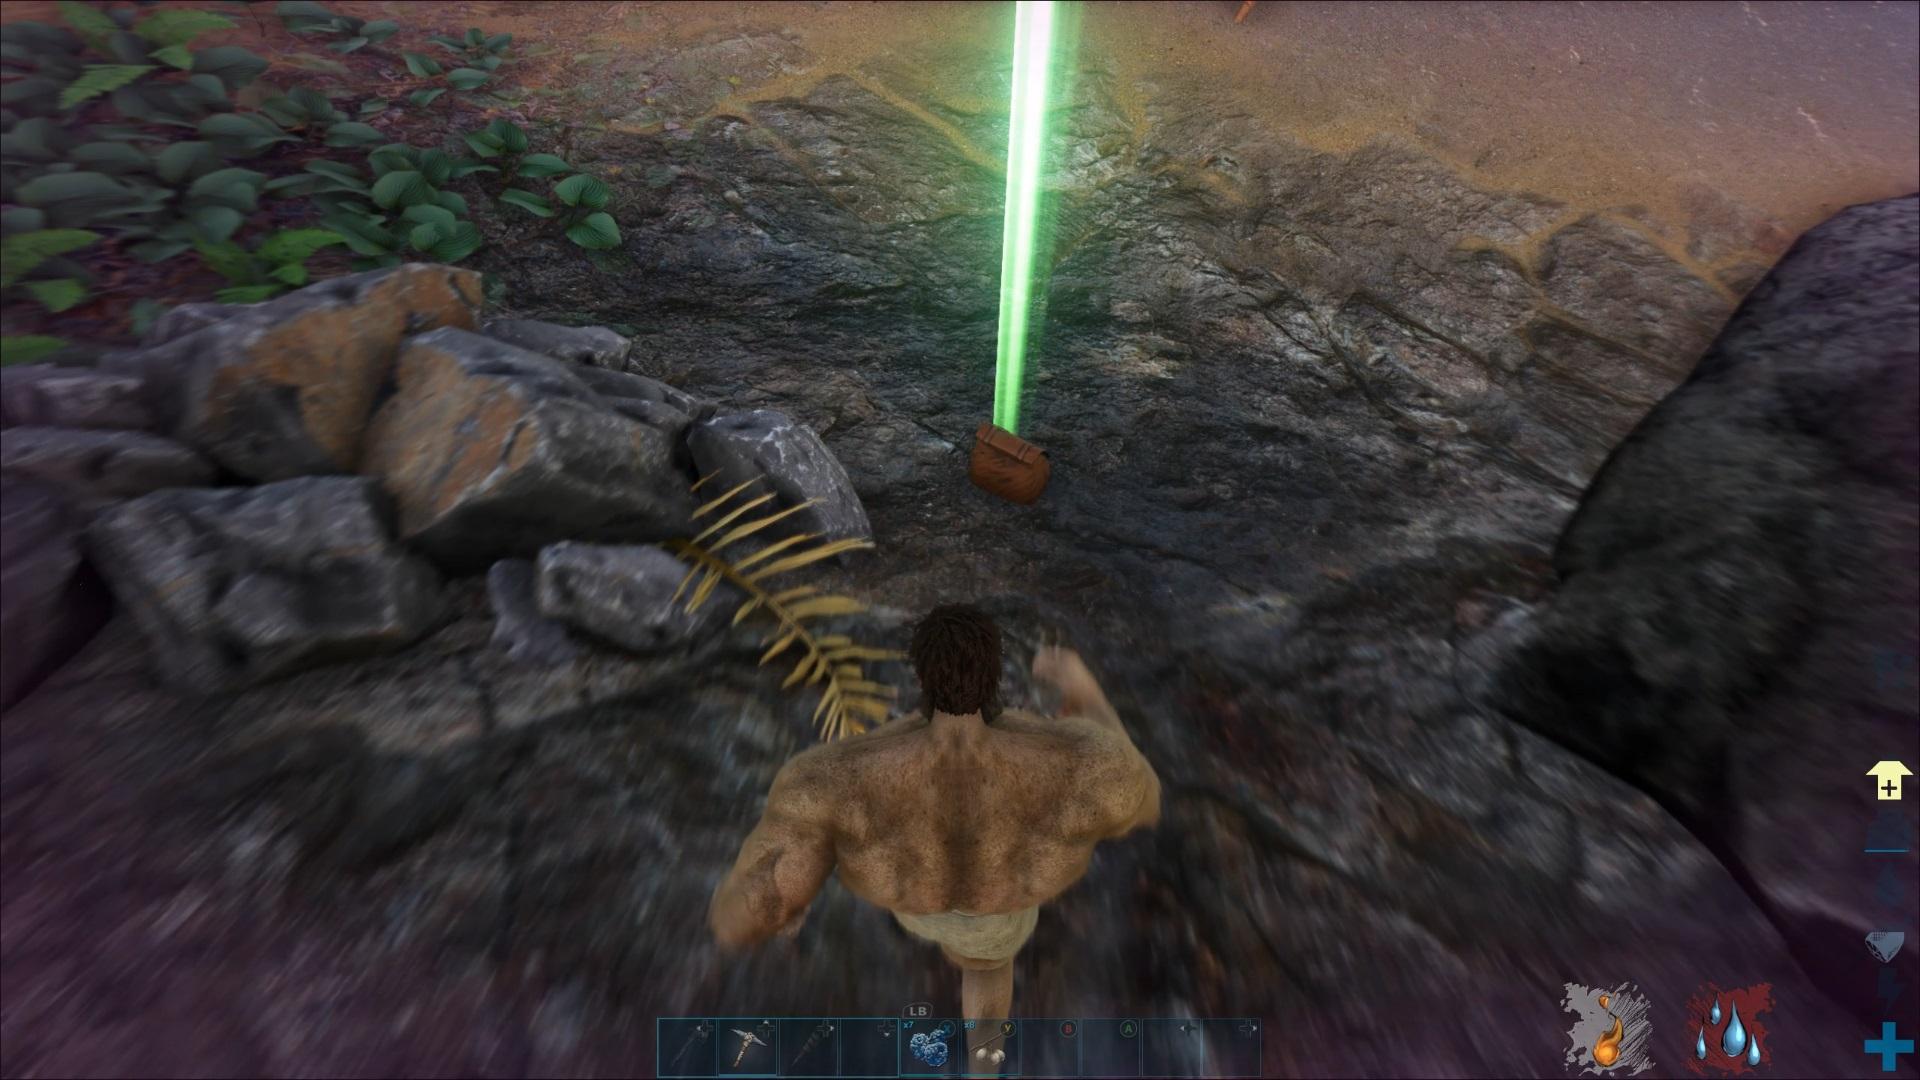 717ec6e7be17f98fd43367a6359b55a4 - 【ARK Survival Evolved】序盤攻略【究極の恐竜時代を生き抜く!】